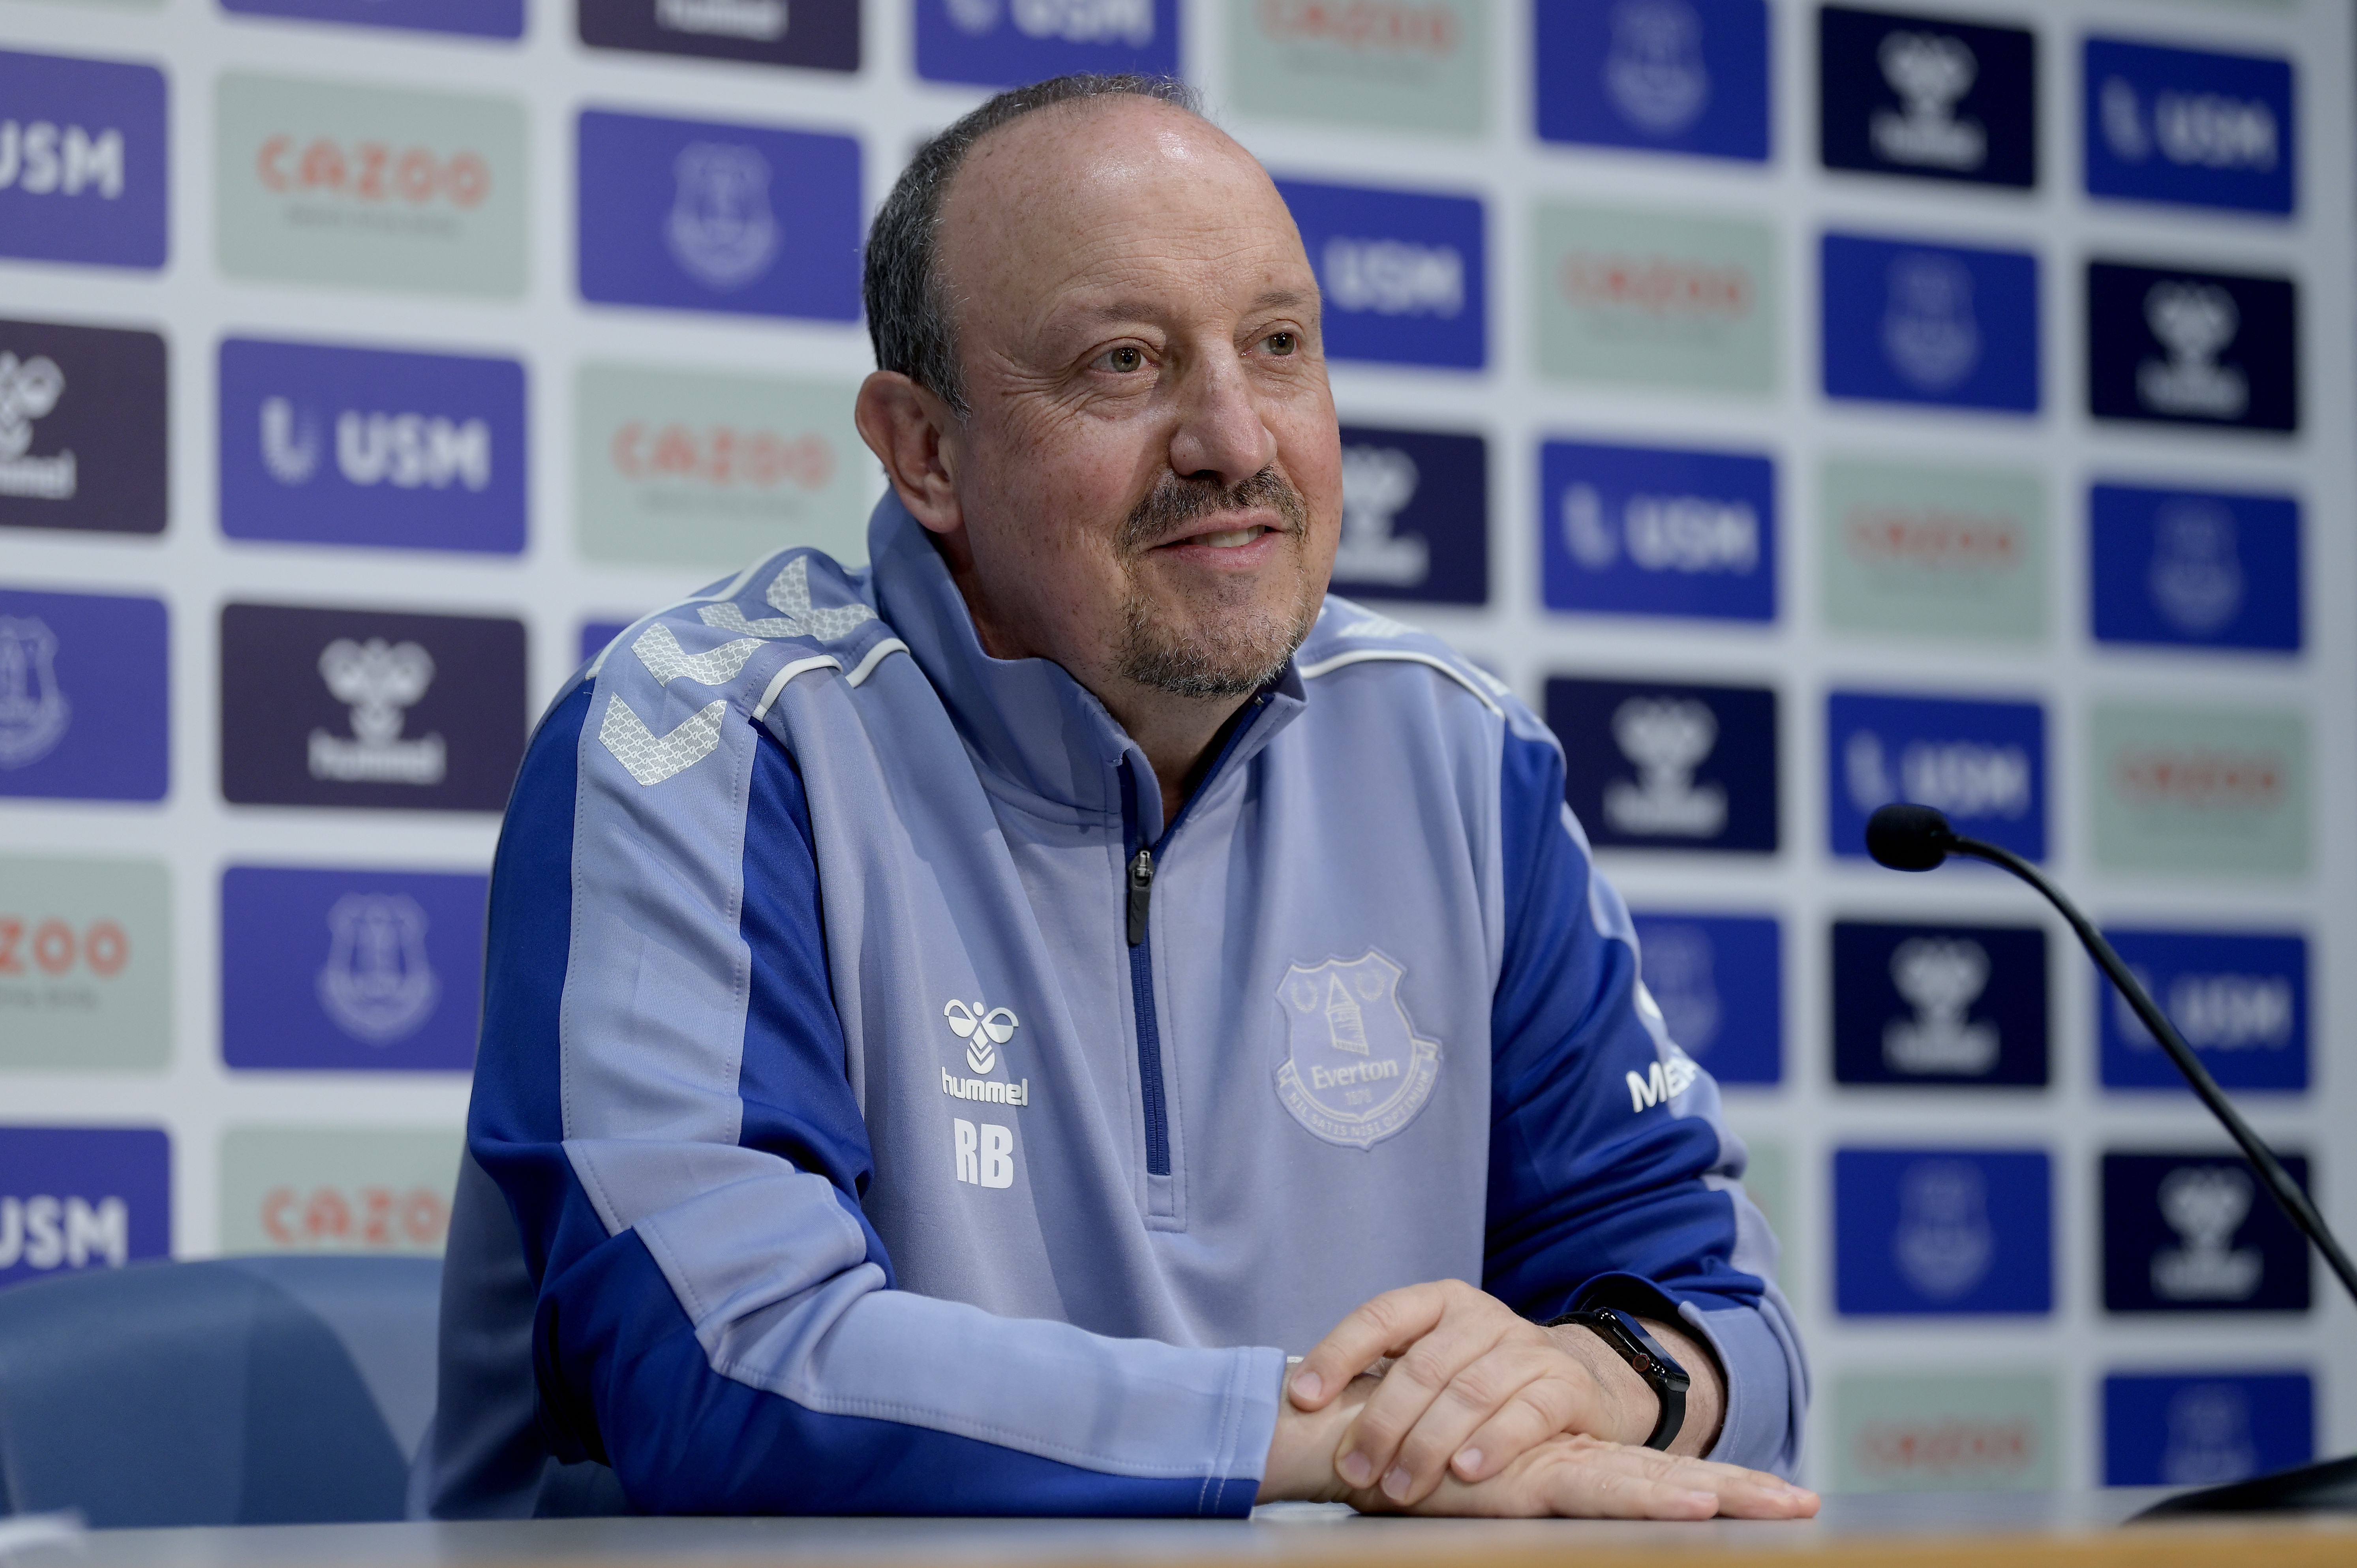 Rafael Benitez First Press Conference at Everton